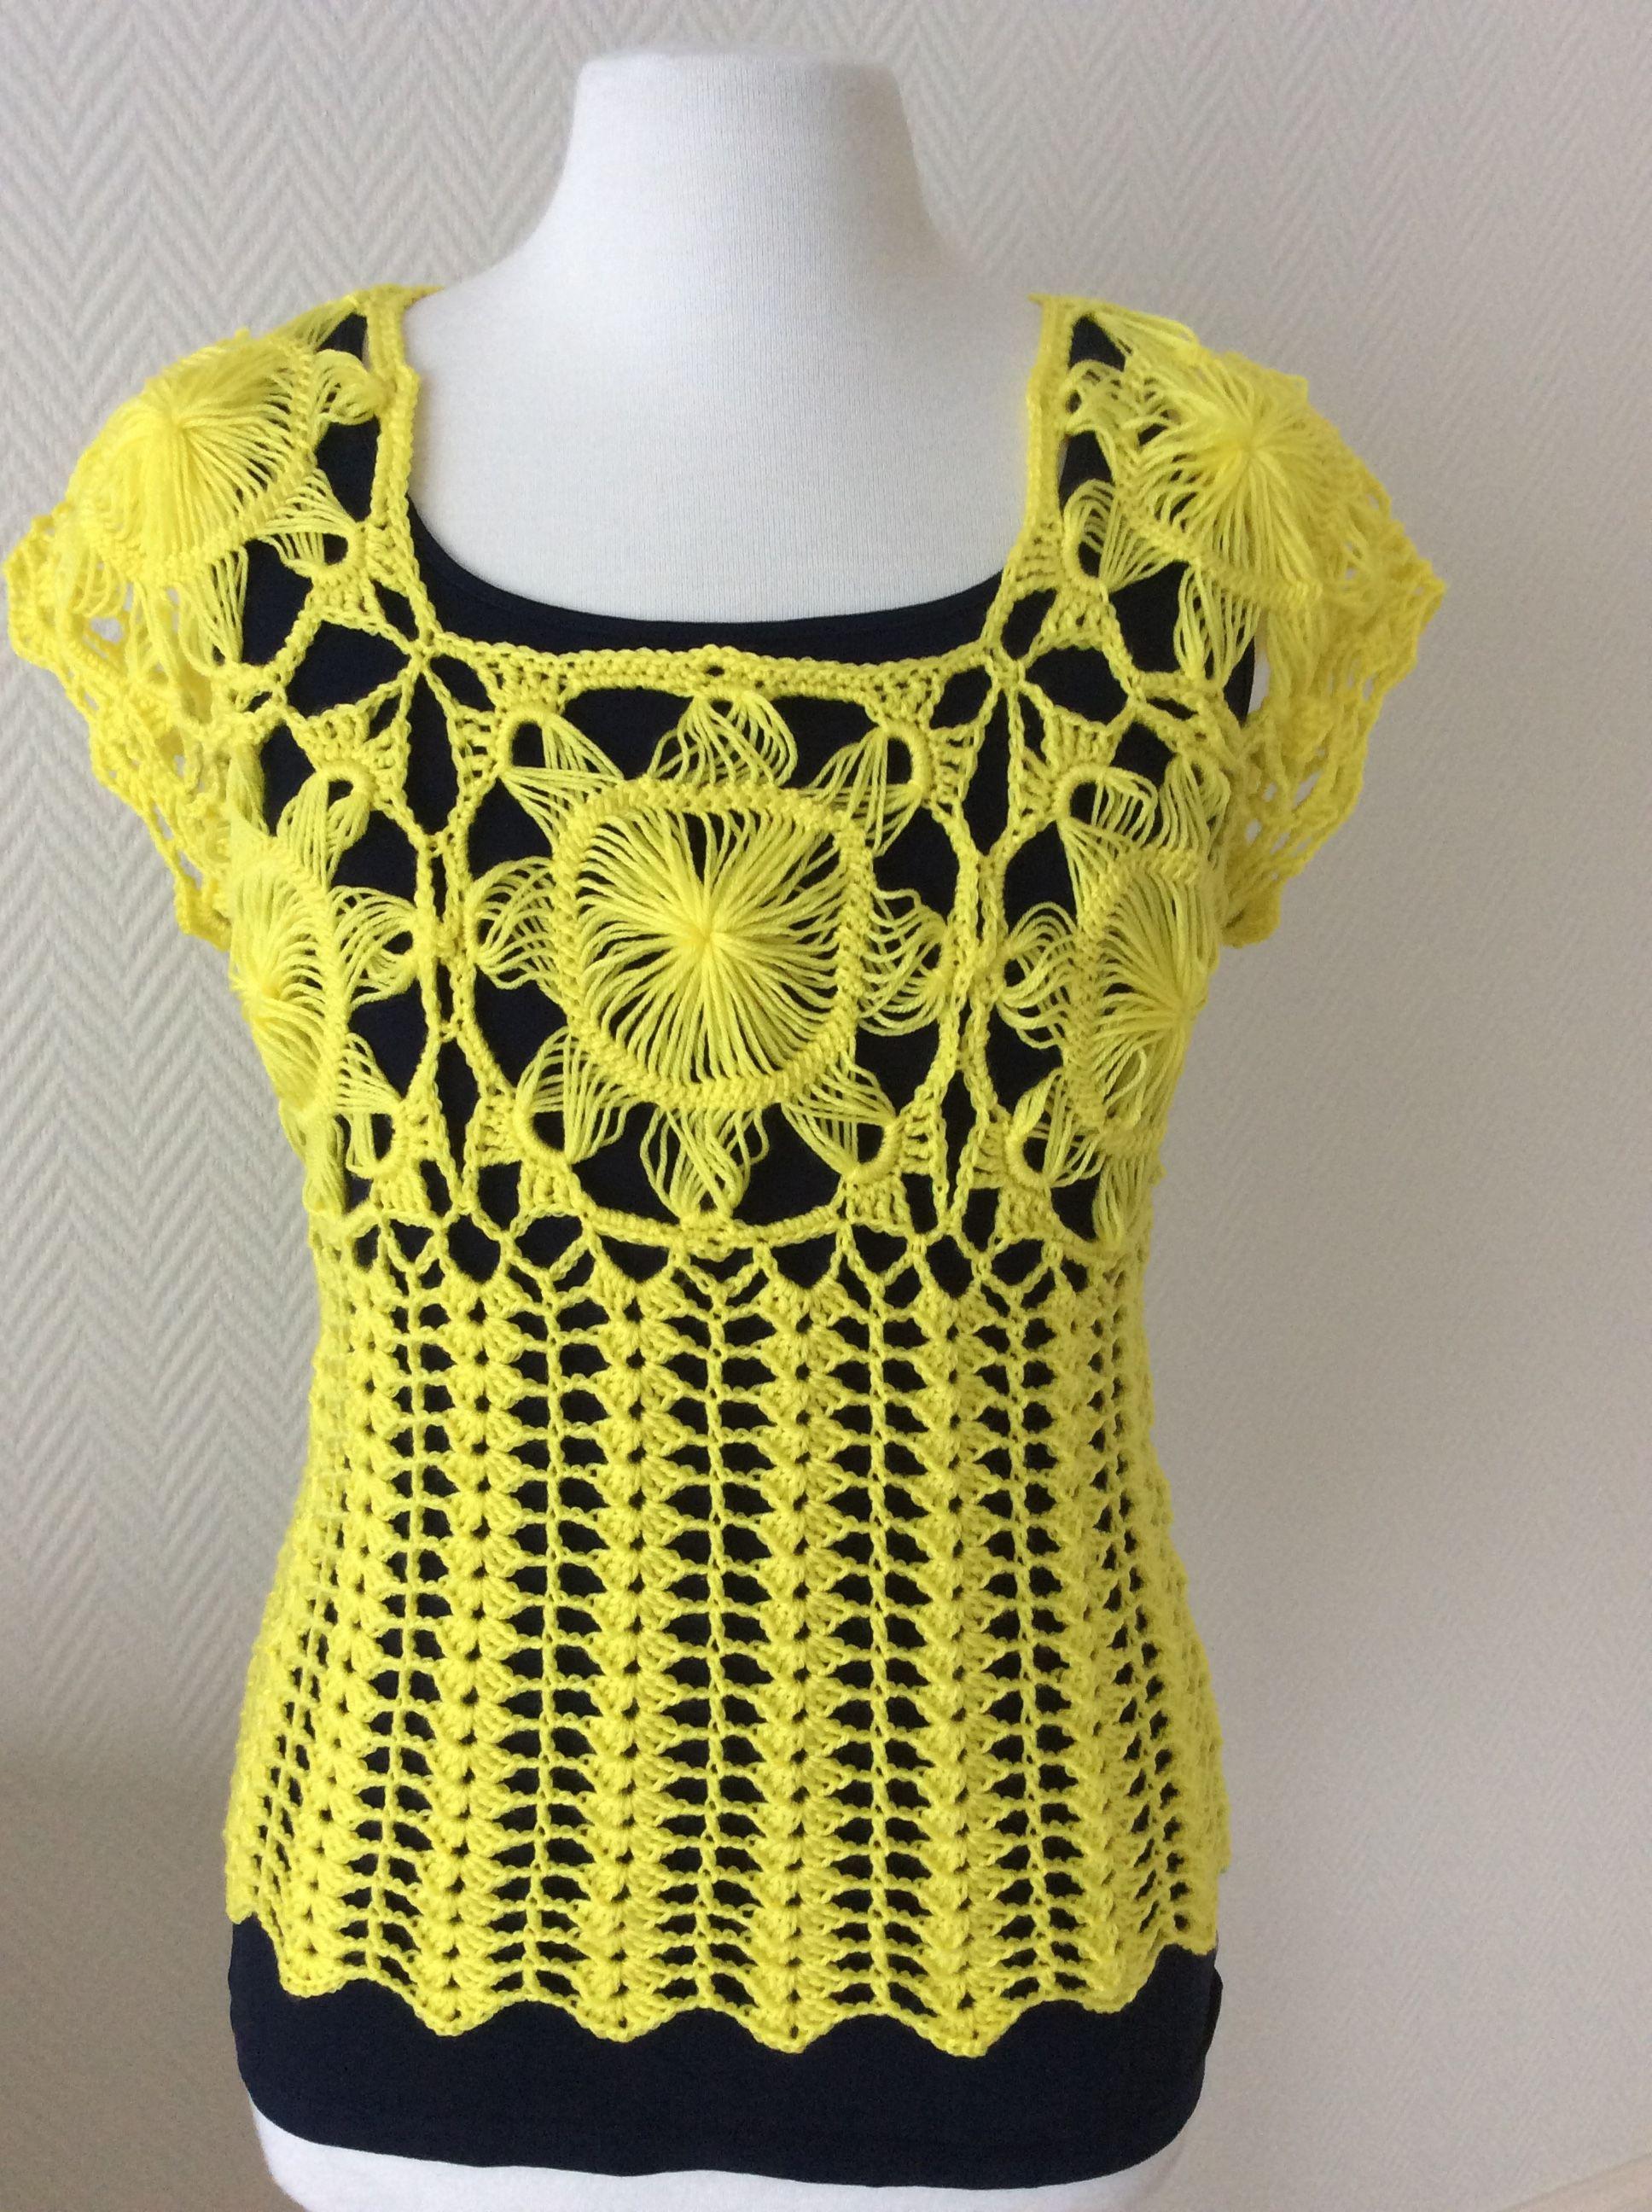 Hairpin lace top pats crochet pinterest crochet hairpin hairpin lace top bankloansurffo Image collections